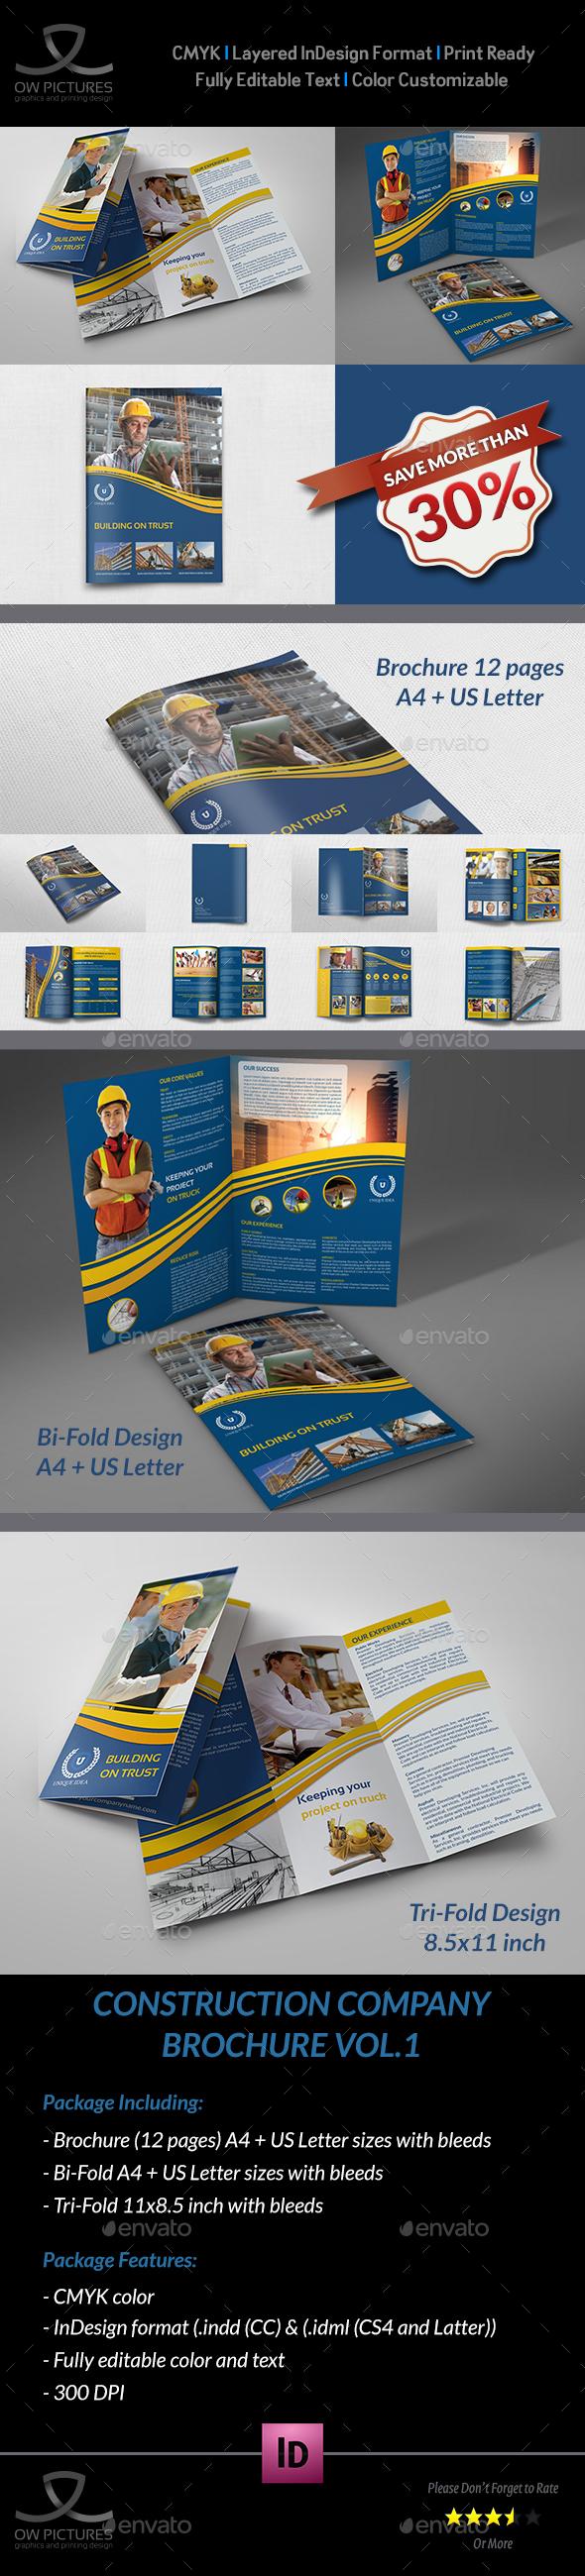 Construction Company Brochure Template Bundle InDesign INDD - Company profile brochure template